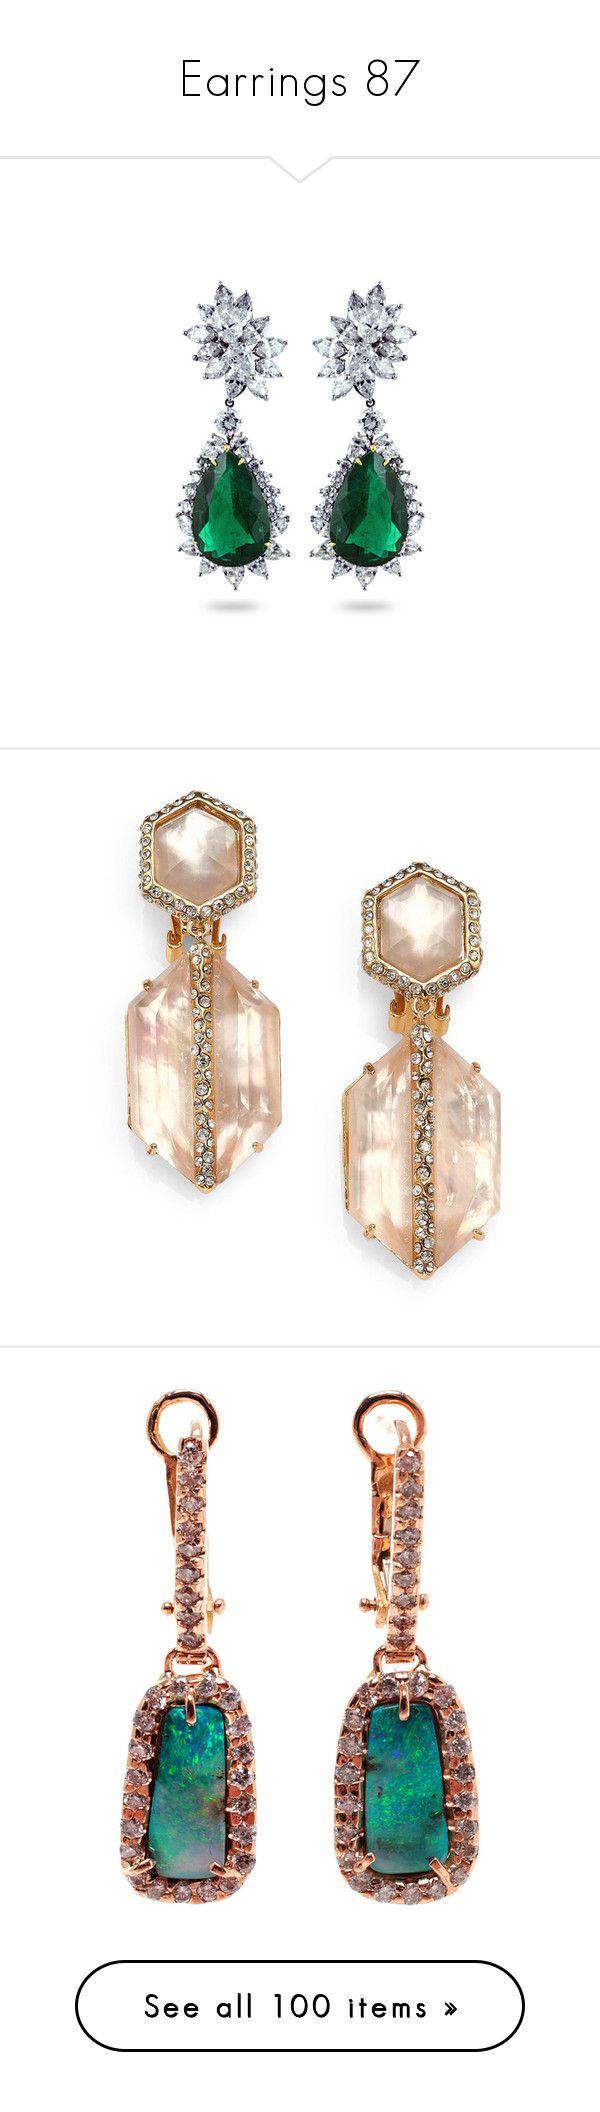 """Earrings 87"" by singlemom ❤ liked on Polyvore featuring jewelry, earrings, chanel, accessories, earring jewelry, chanel pendant, pendant jewelry, vintage jewelry, vintage pendants and brincos"